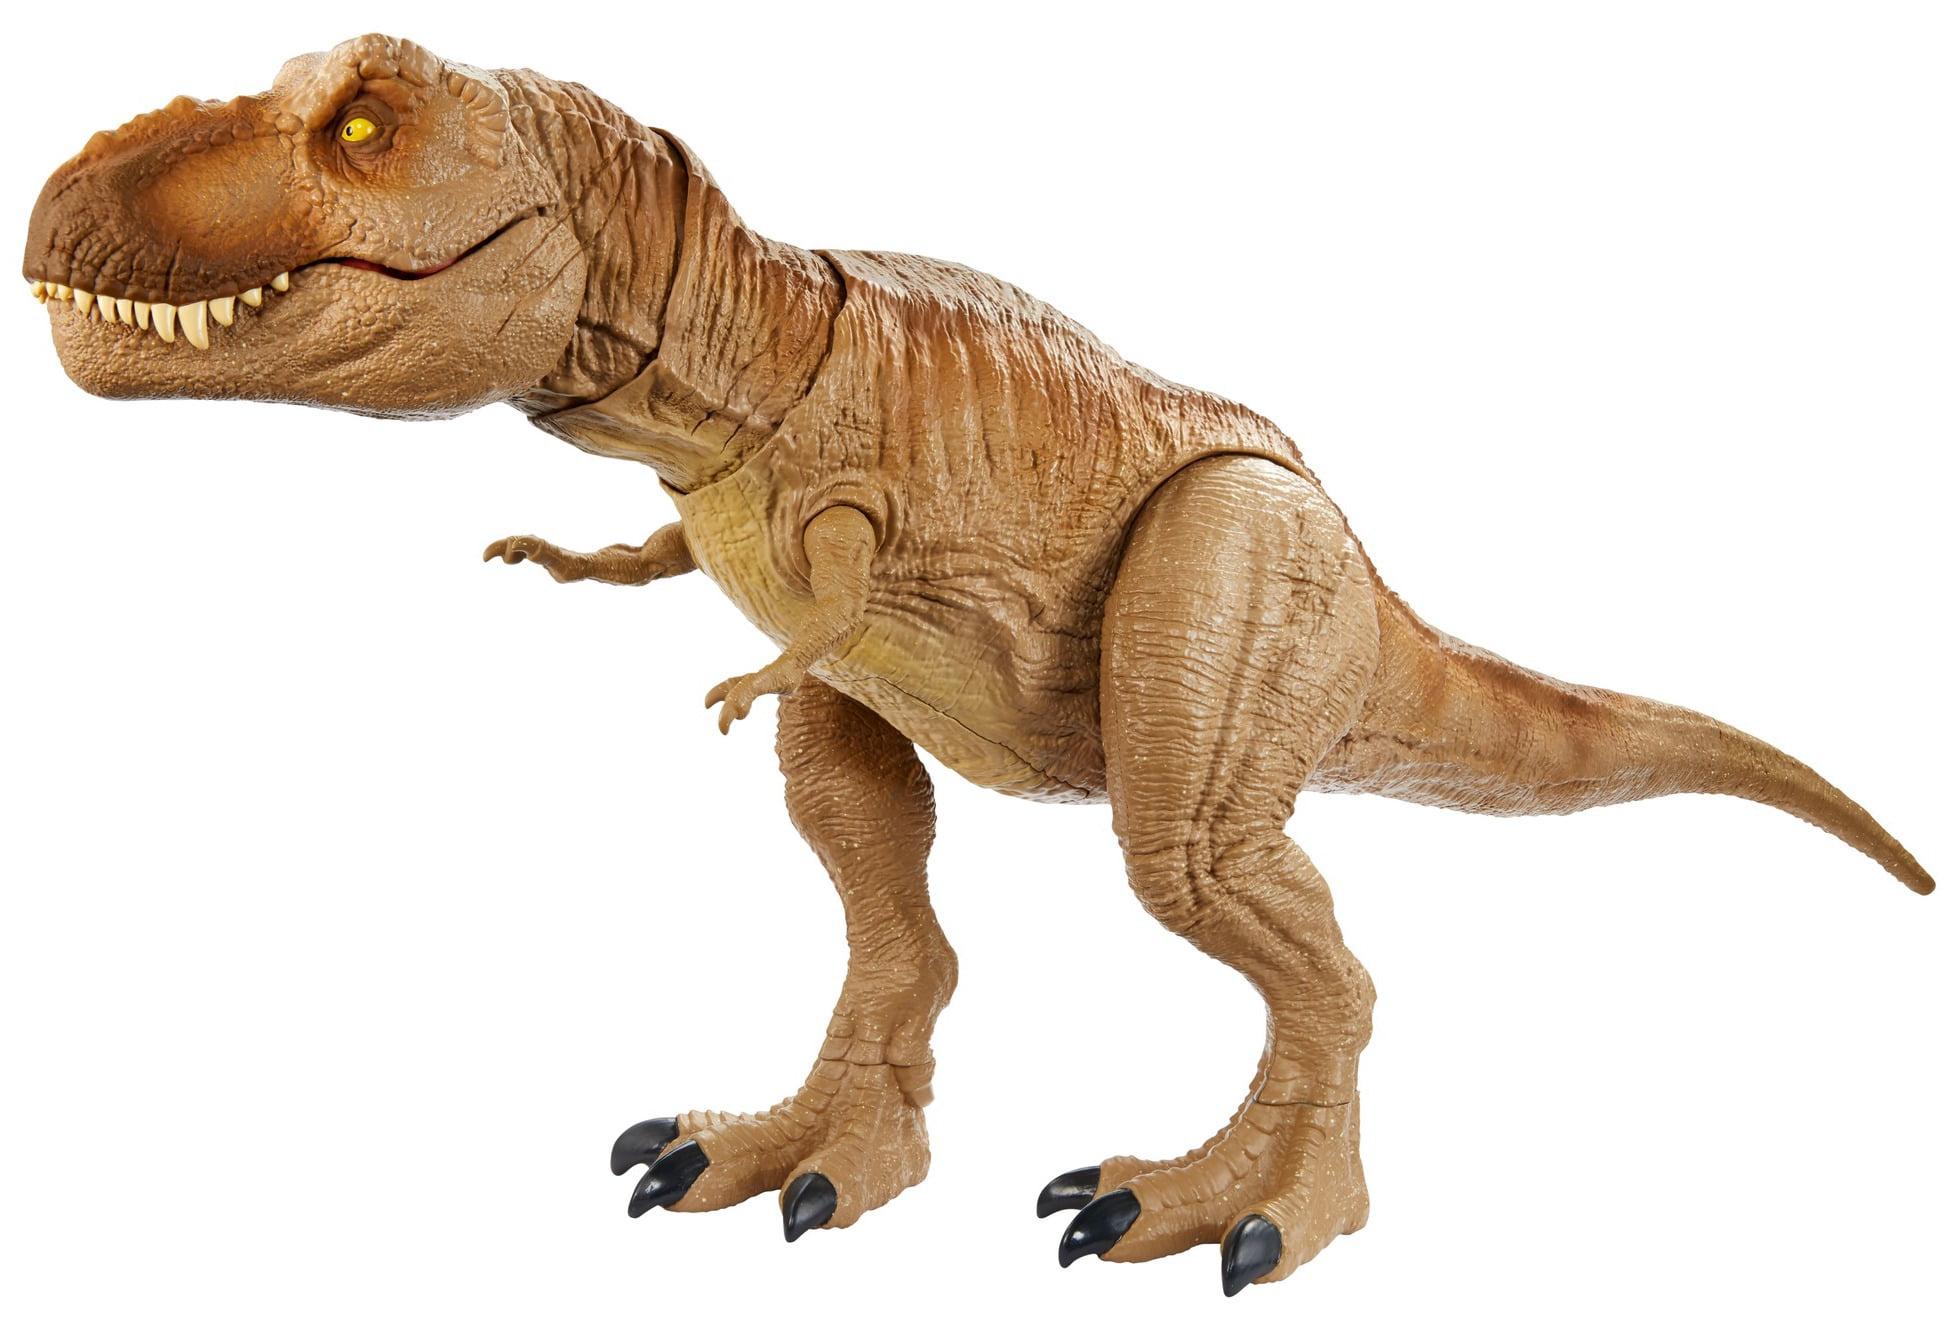 Jurassic World Camp Cretaceous Epic Roarin Tyrannosaurus Rex Large Action Figure